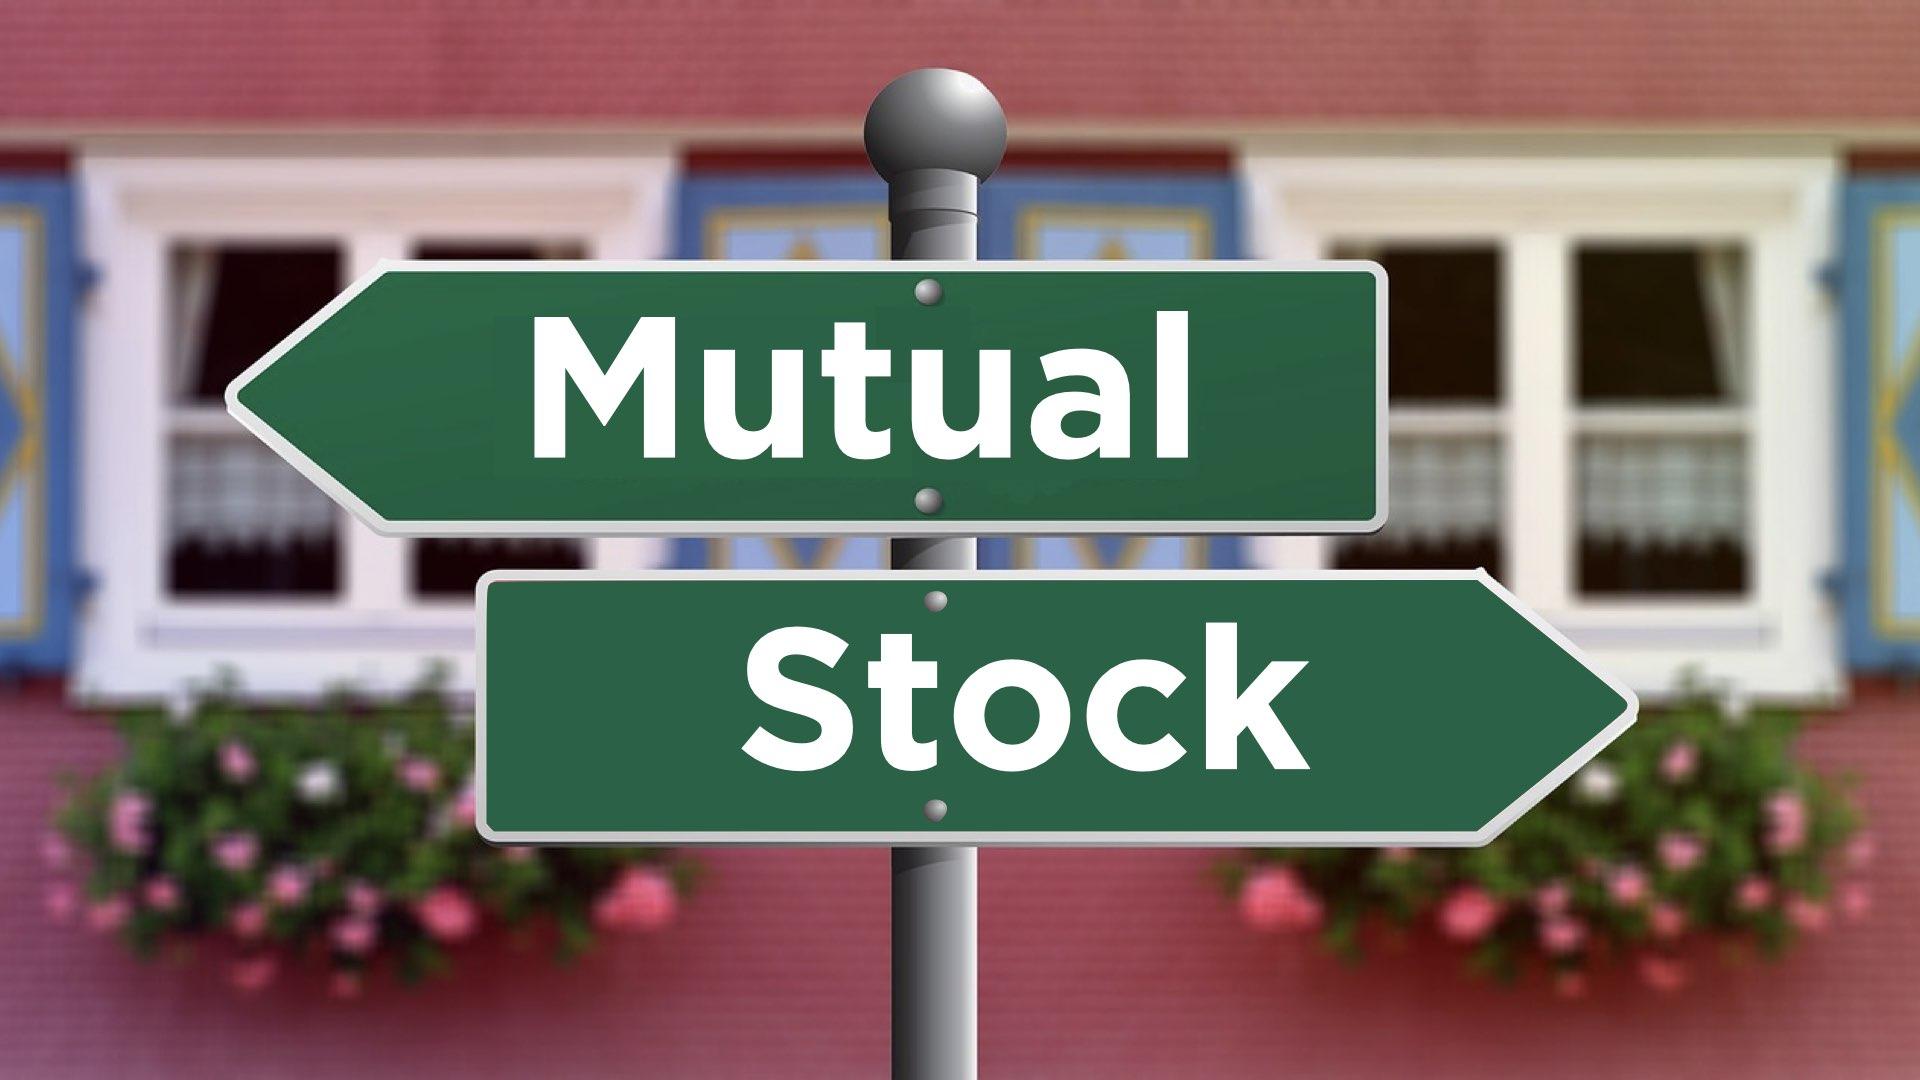 Mutual vs. Stock Insurer: Where Should You Buy Insurance From?